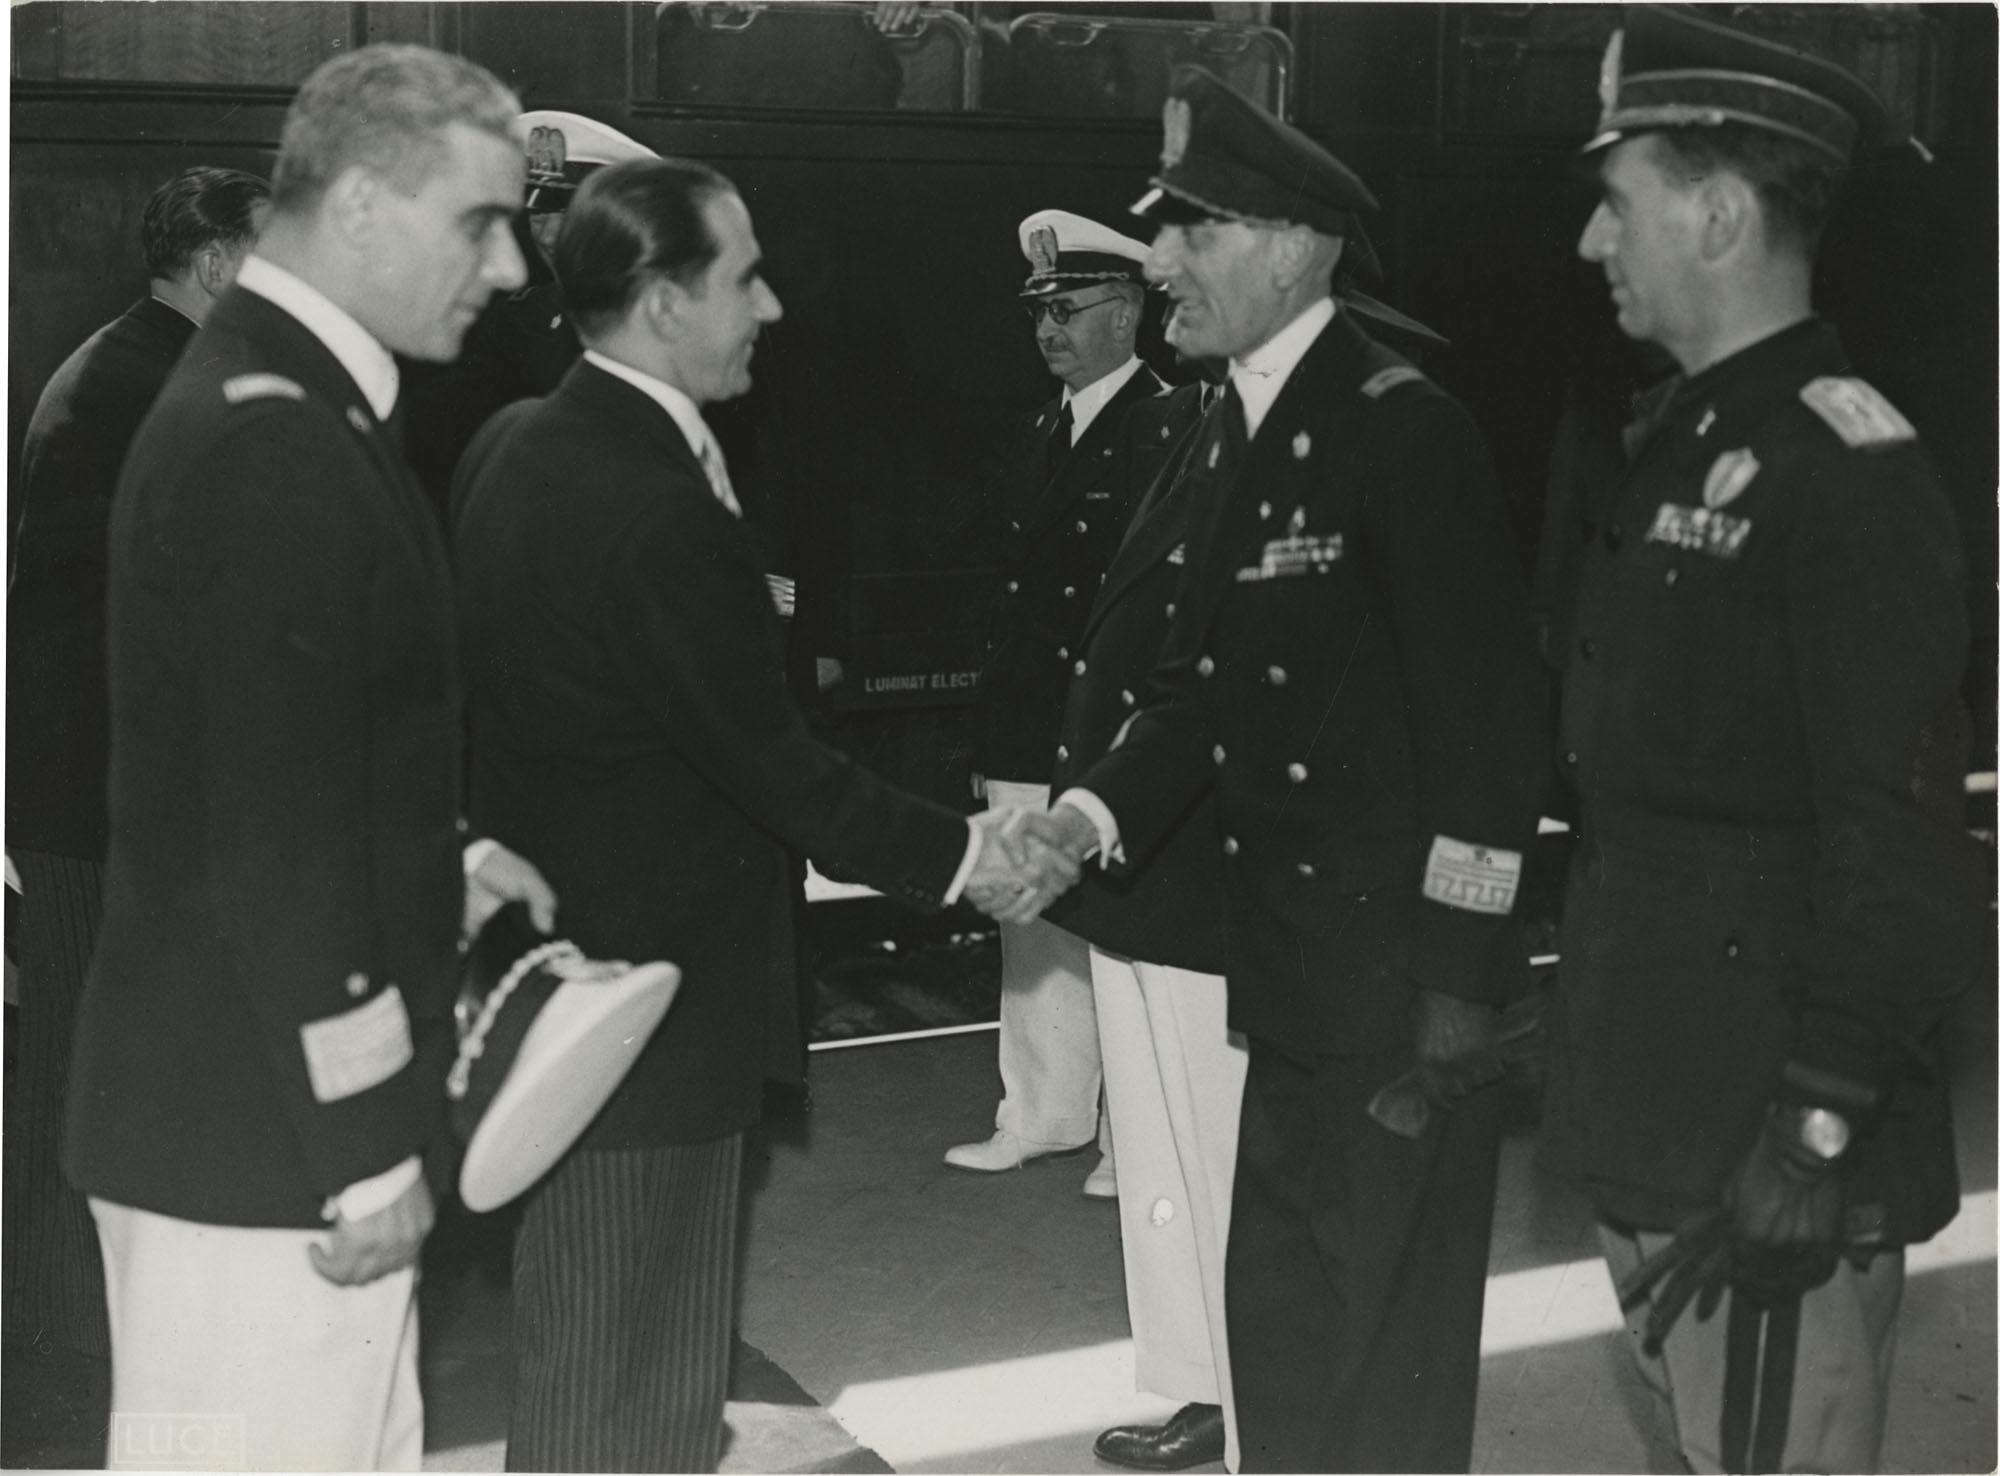 Mihai Antonescu's visit to Benito Mussolini, Photograph 26